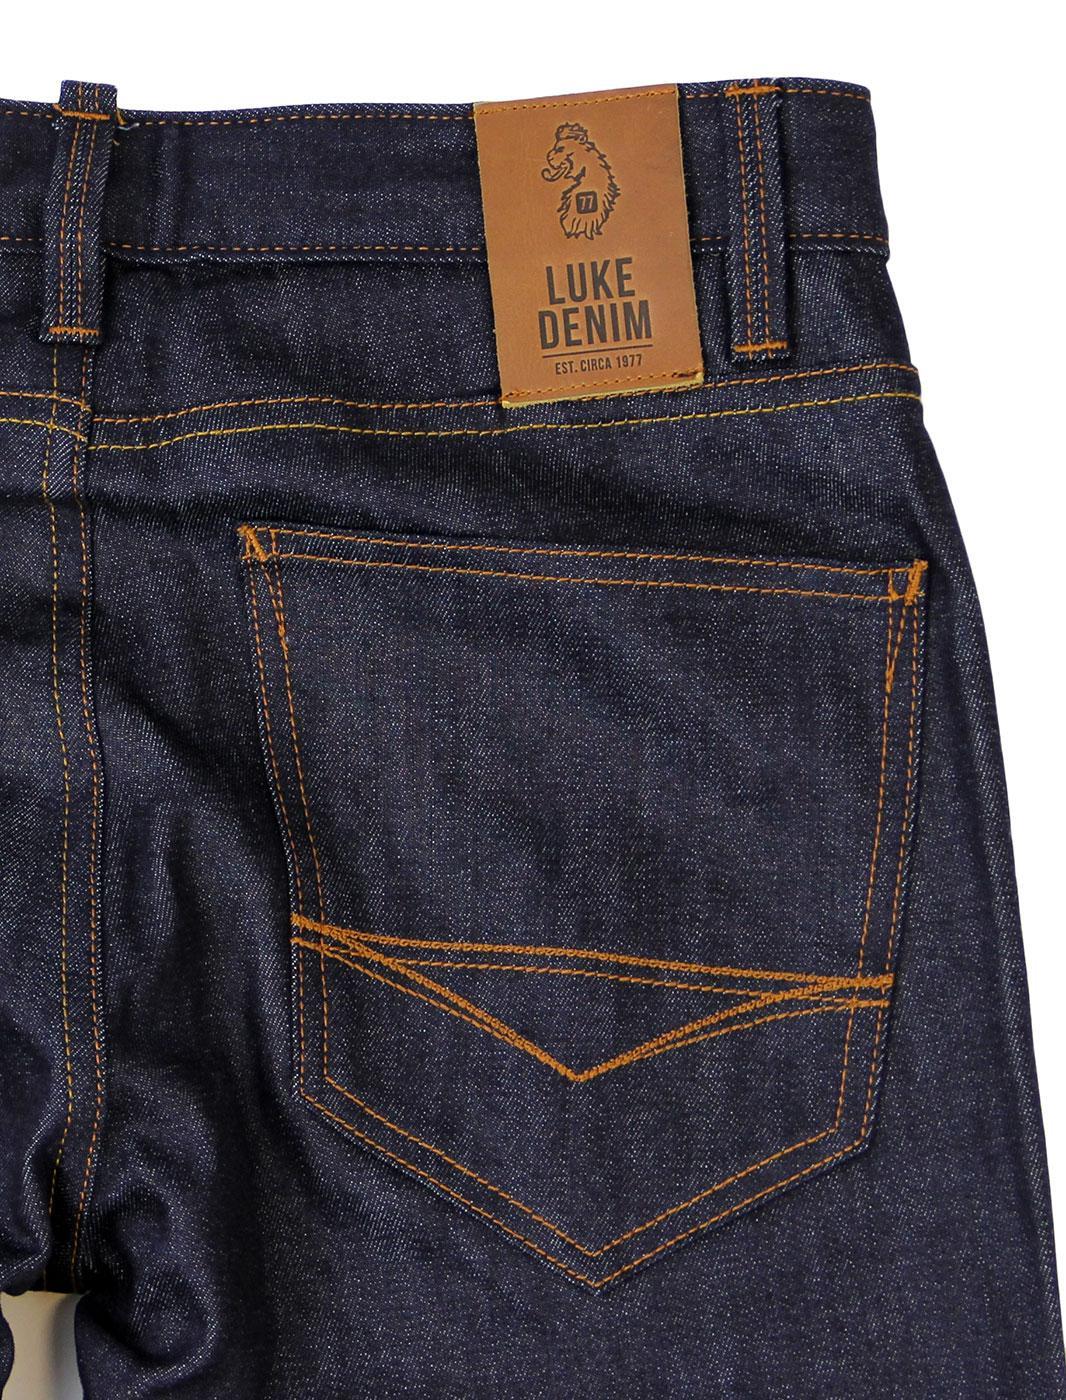 bc3e17aab Rui LUKE DENIM Retro Raw Stretch Skinny Jeans